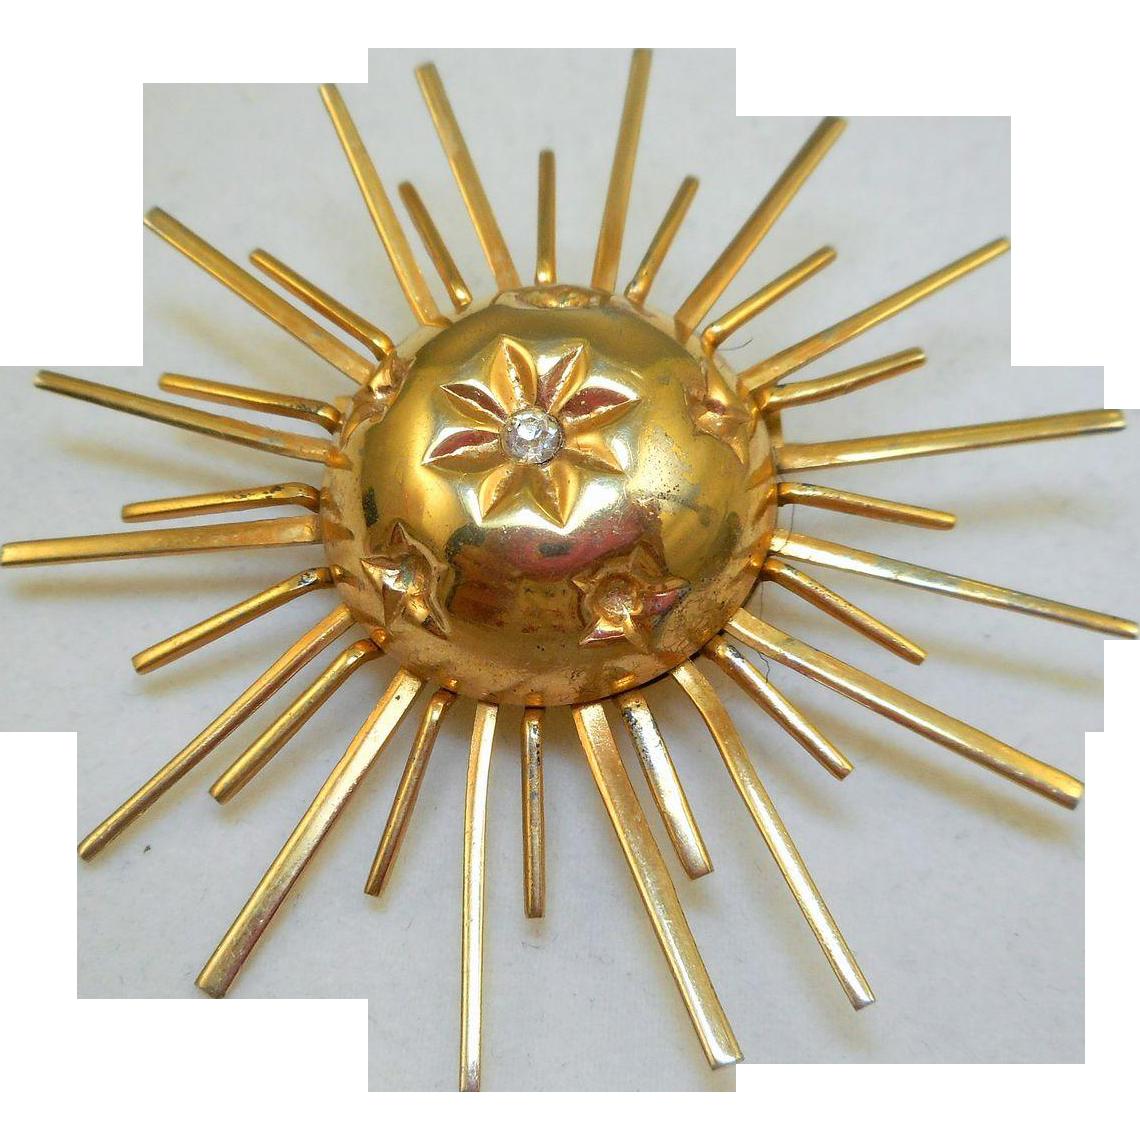 Vintage Sunburst Pin